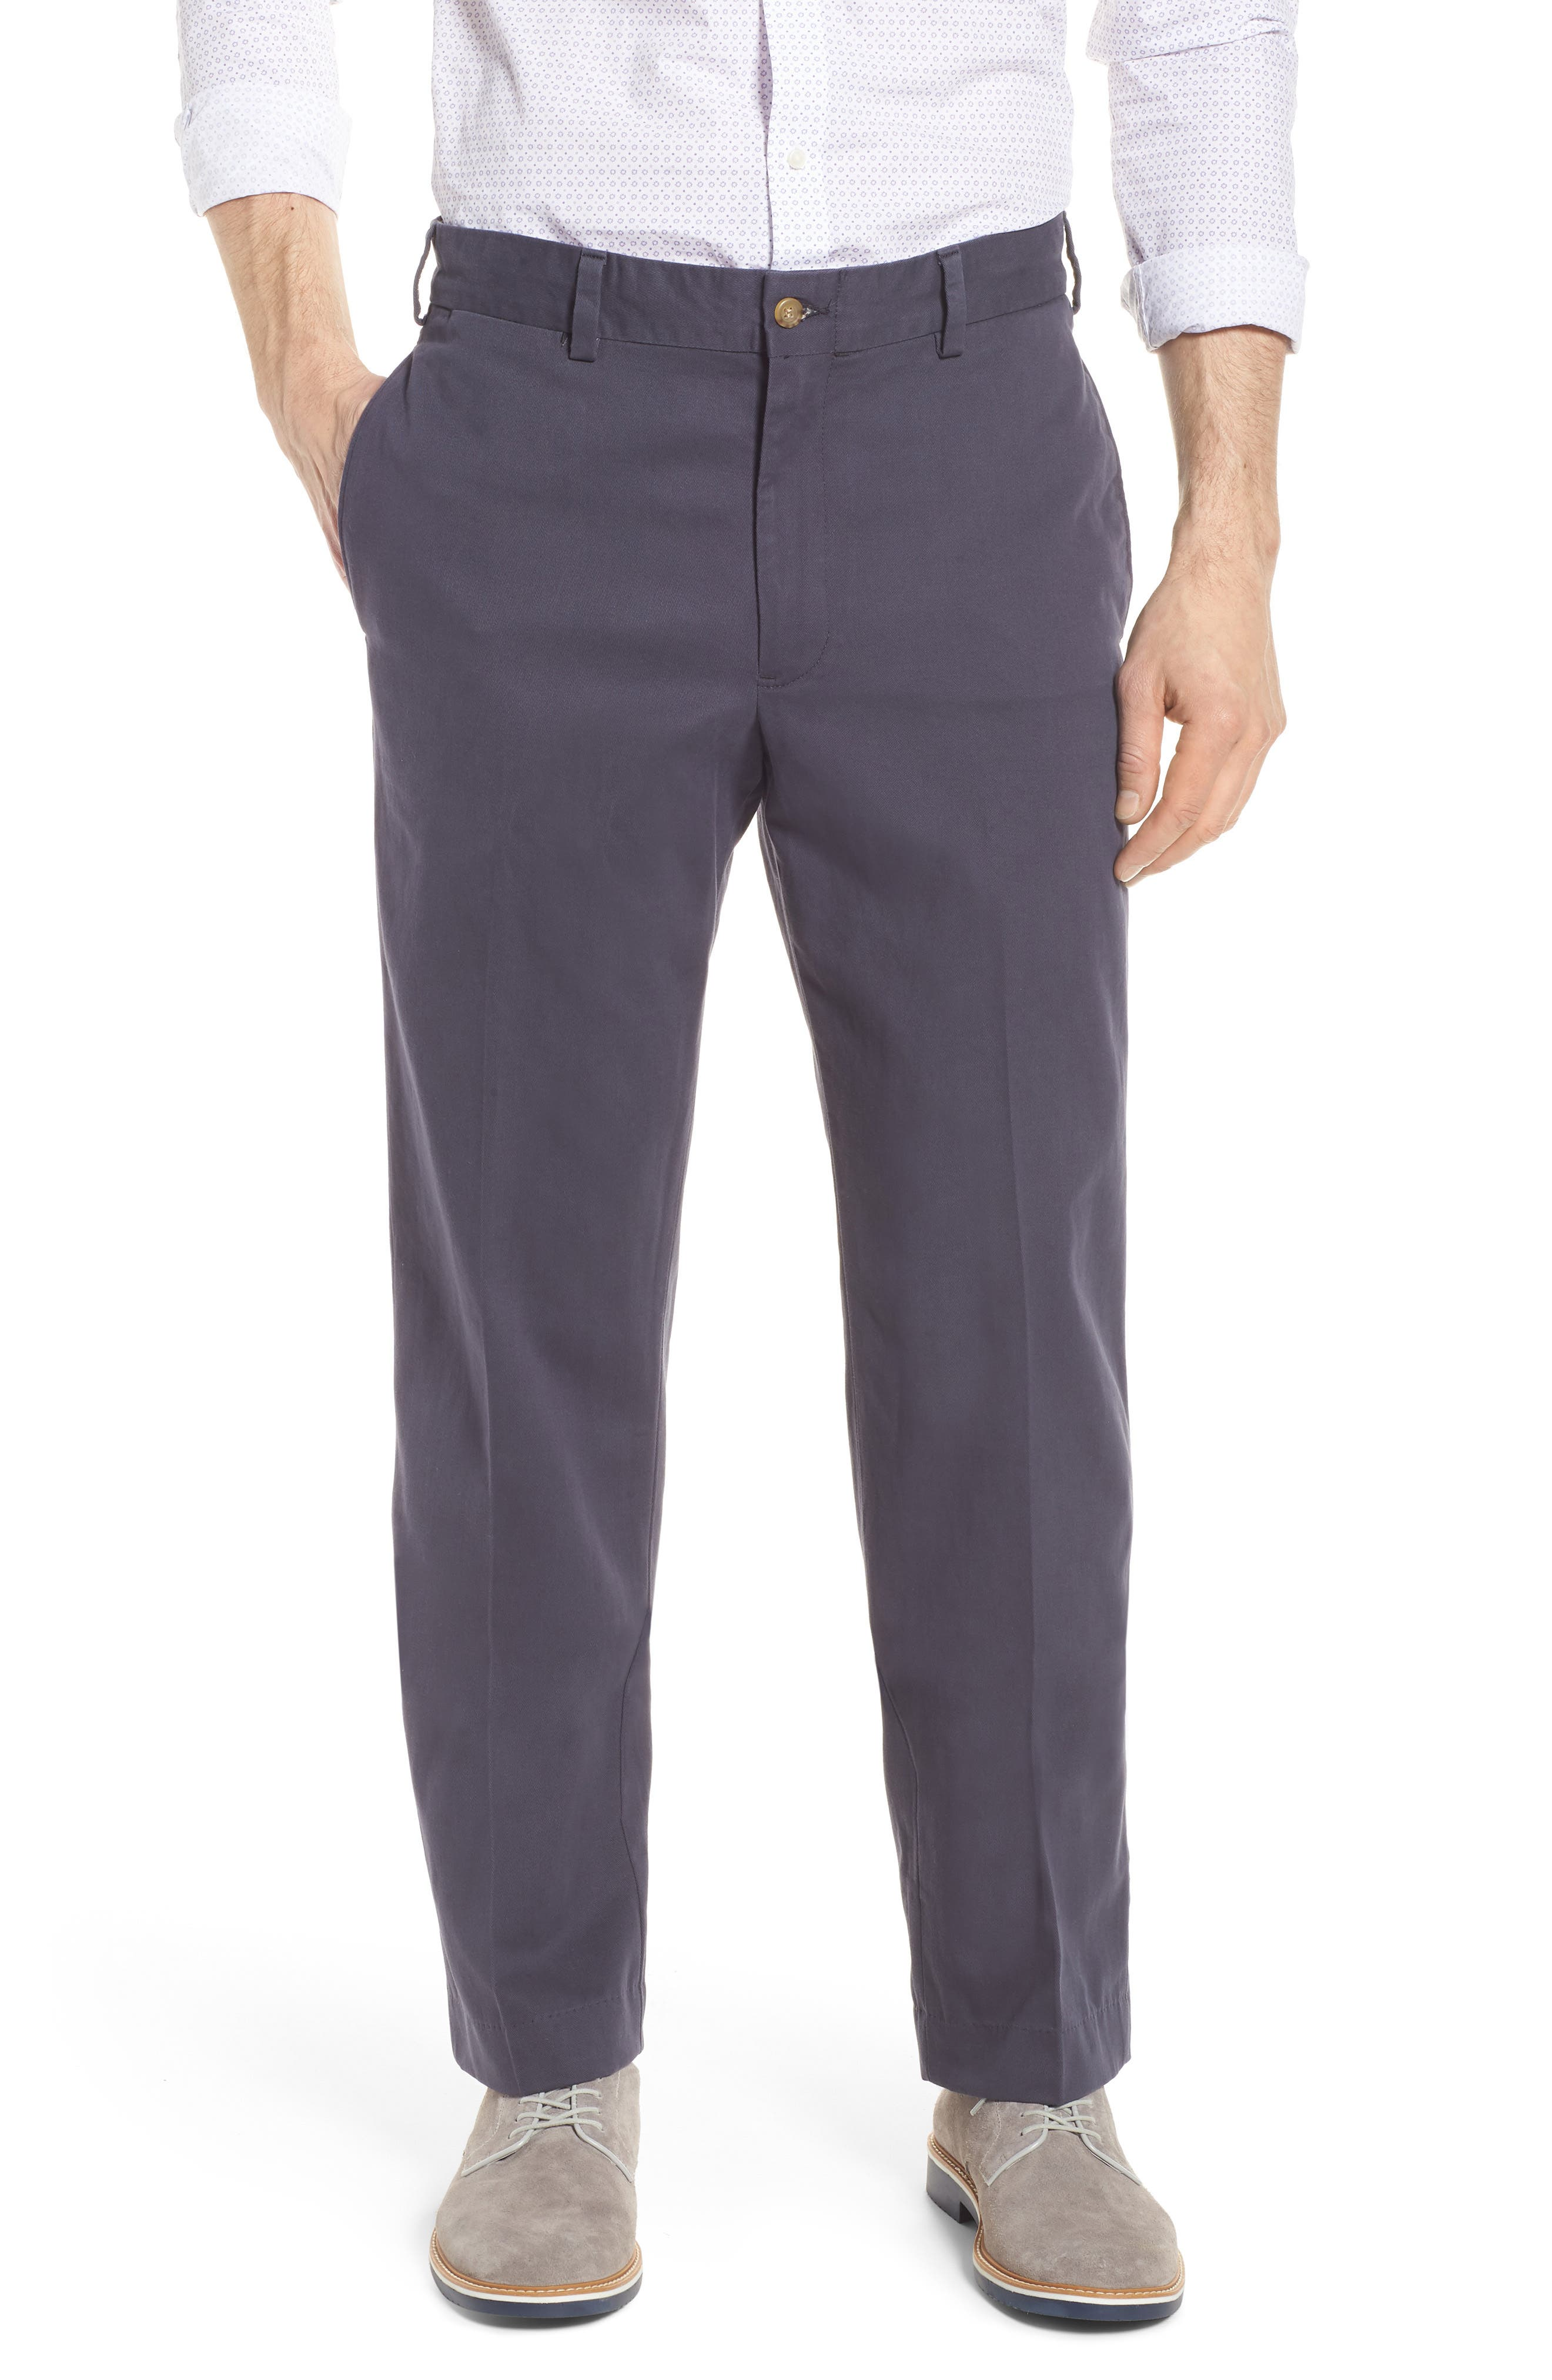 M2 Classic Fit Flat Front Vintage Twill Pants,                         Main,                         color,